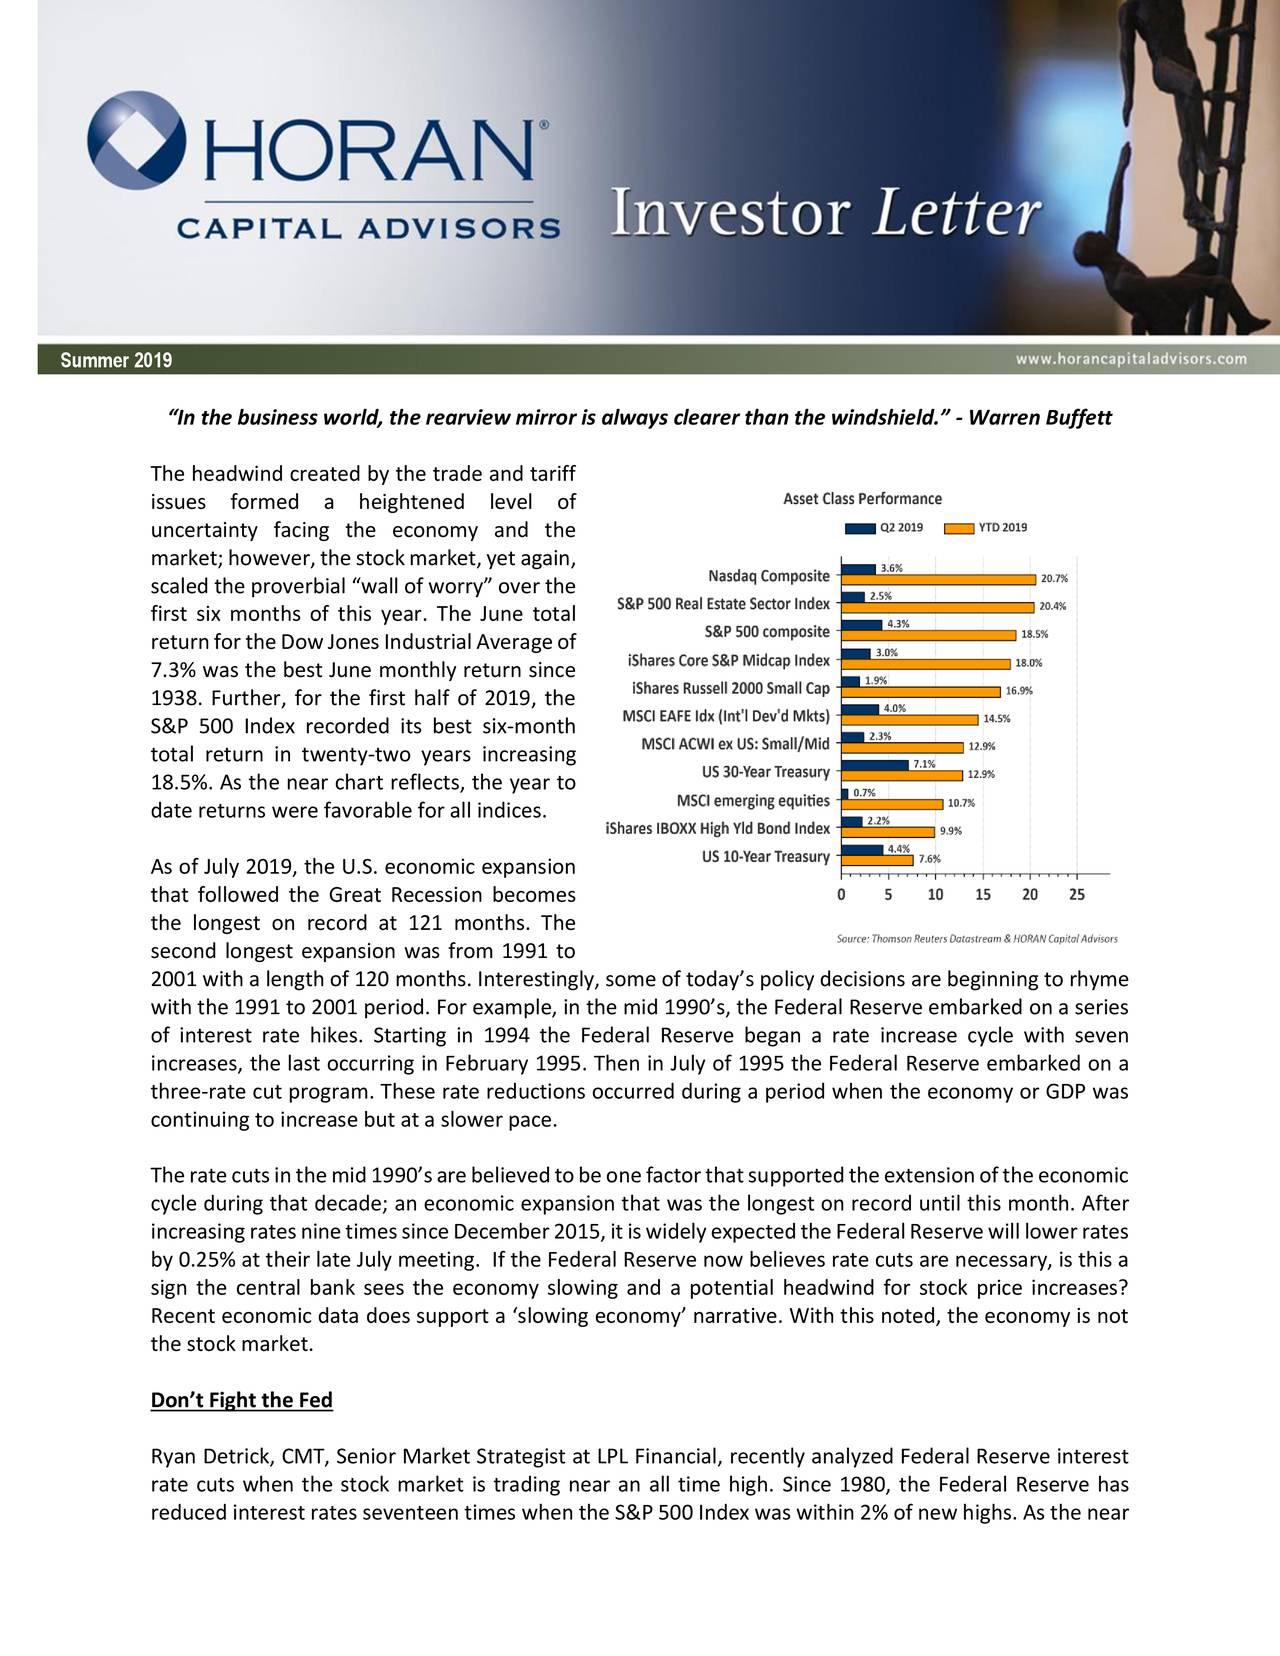 Summer 2019 Investor Letter: A Rate Cut Seems Near